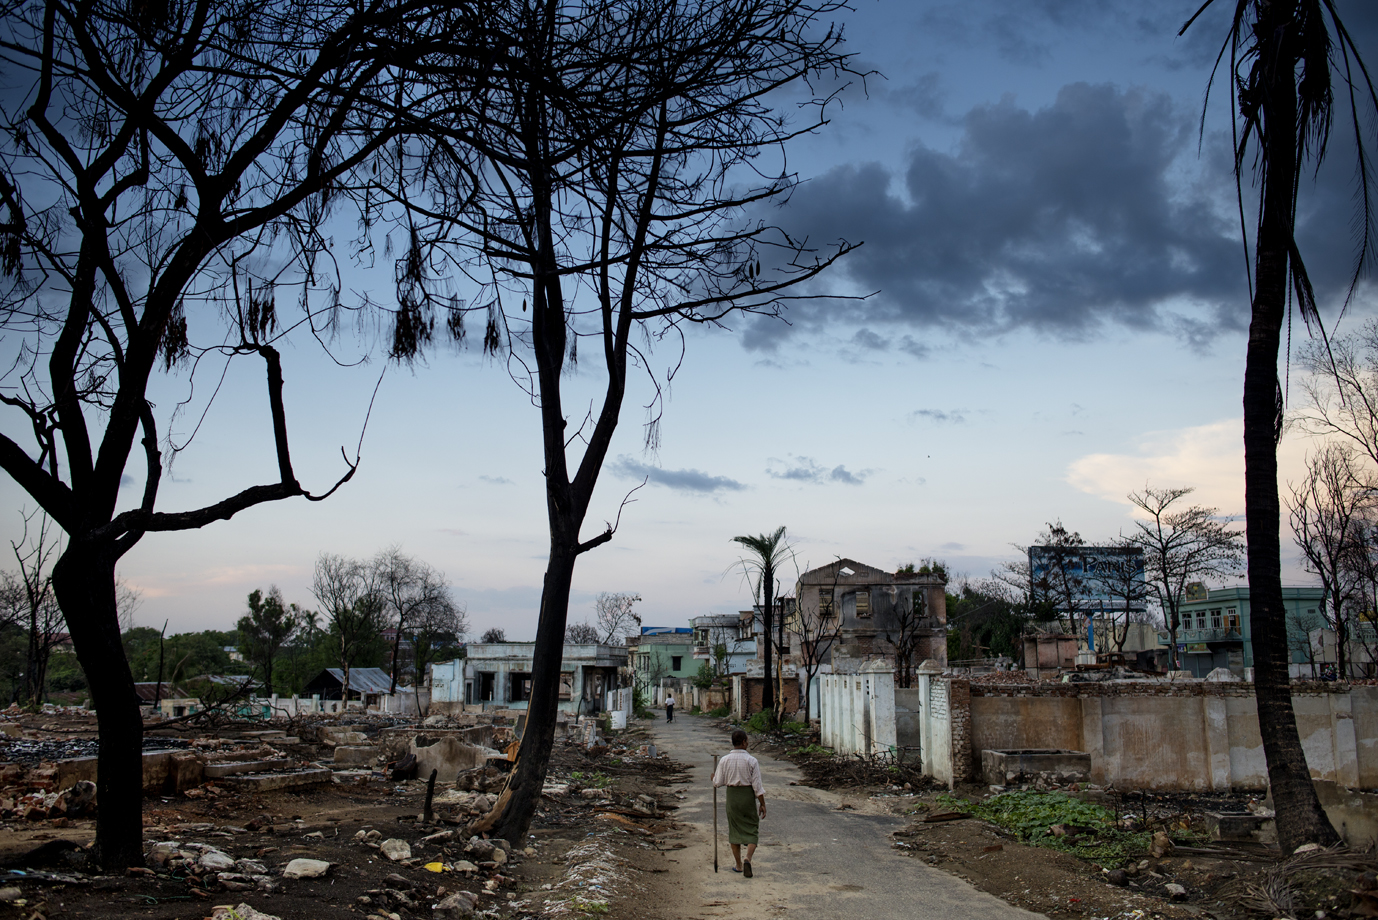 A Muslim man walks through the ruins what weeks before was a Muslim neighbourhood. It was destroyed by Burmese extremist in anti-Muslim riots, Meiktila / Burma - 2013